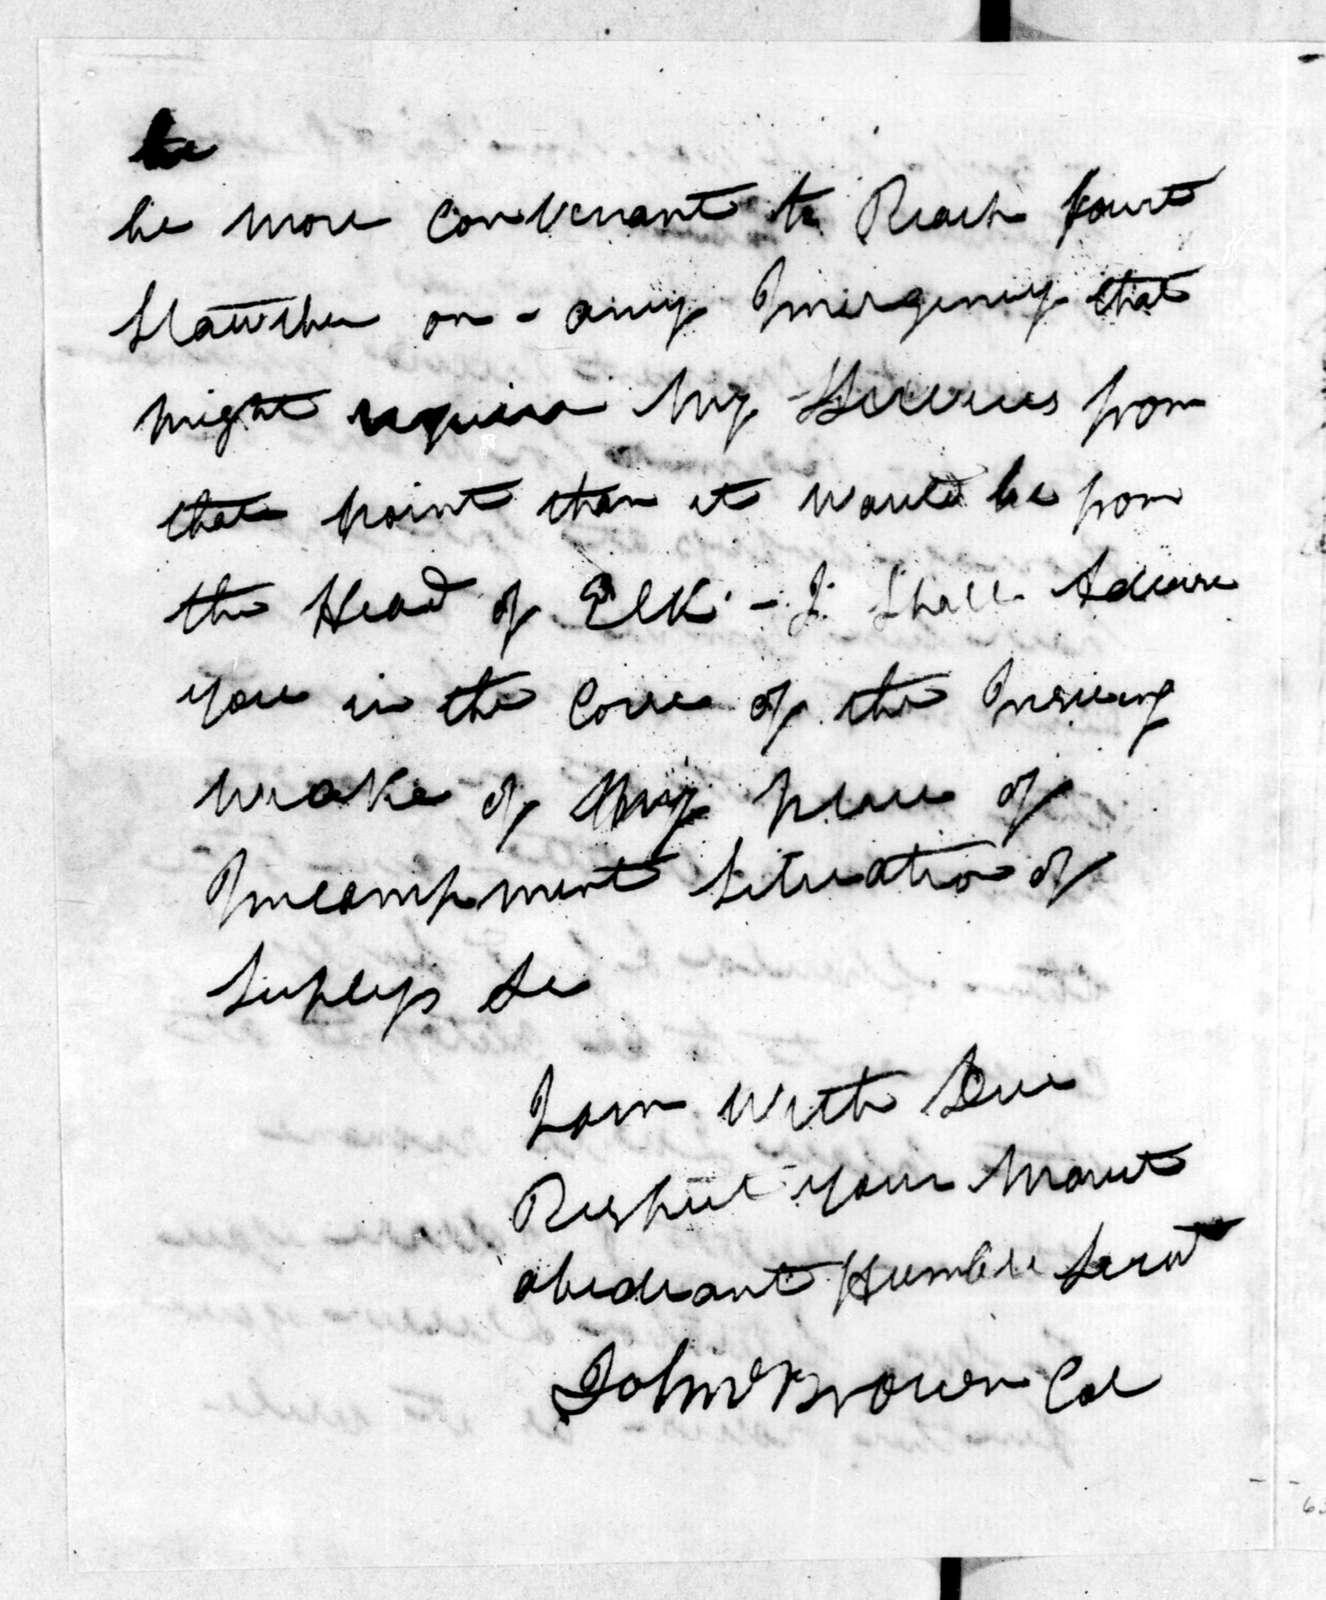 John Brown to Andrew Jackson, February 5, 1814